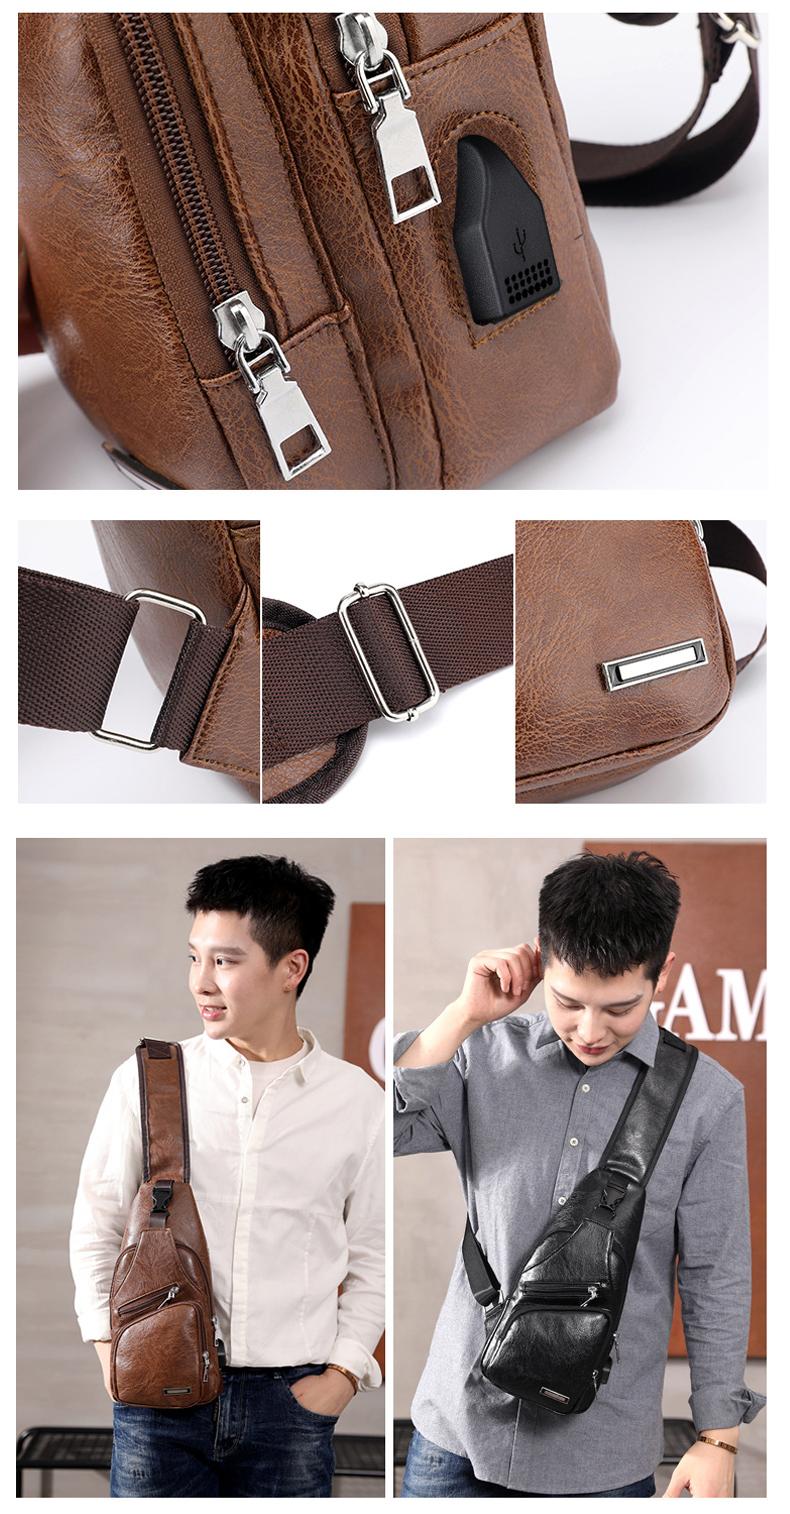 Men's Crossbody Bags Men's USB Chest Bag Designer Messenger bag Leather Shoulder Bags Diagonal Package 2019 new Back Pack Travel 11